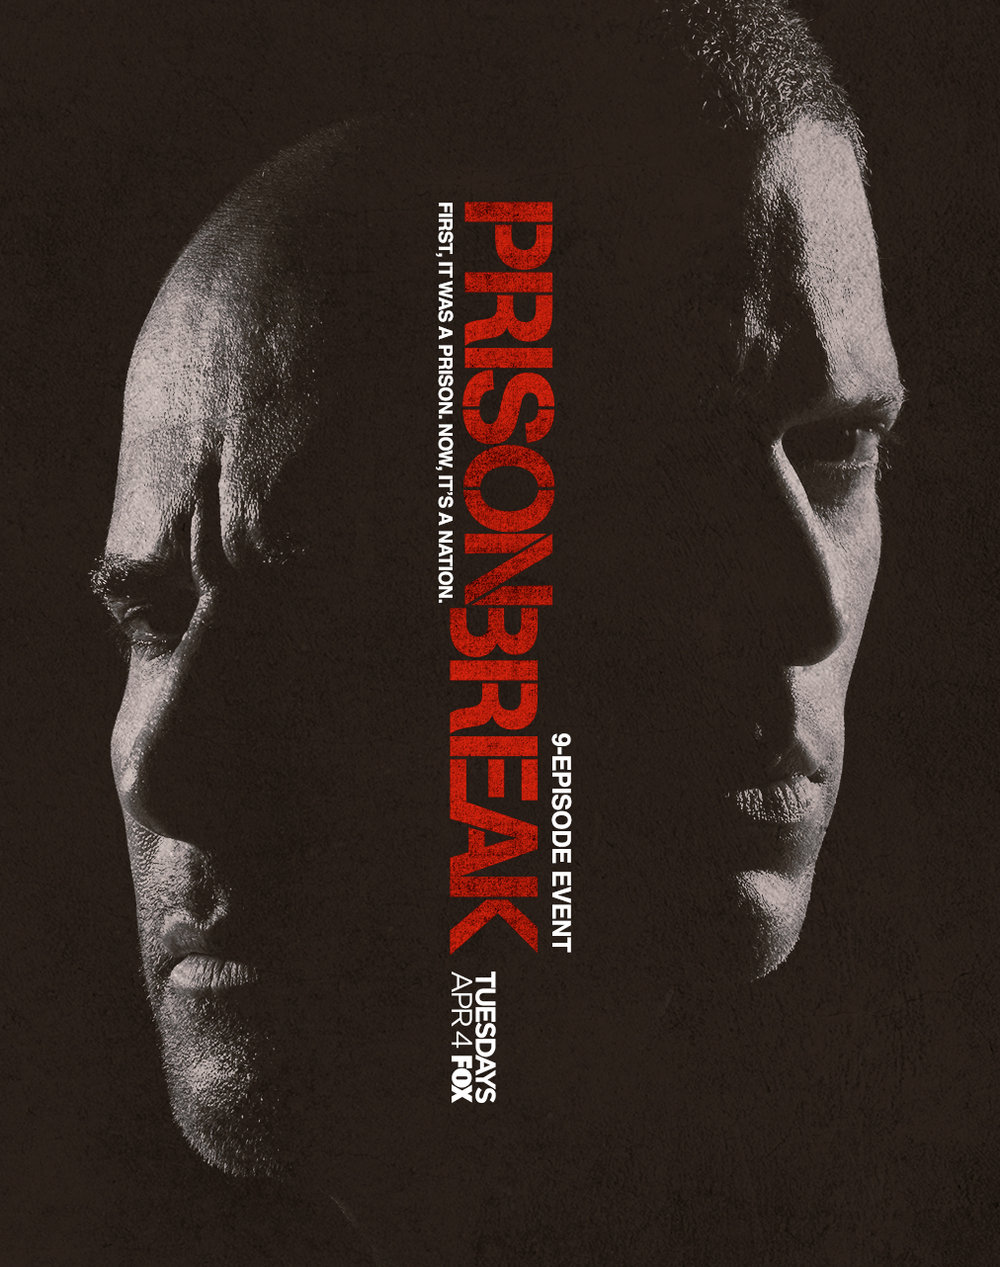 PrisonBreak_Poster_1_FB.jpg